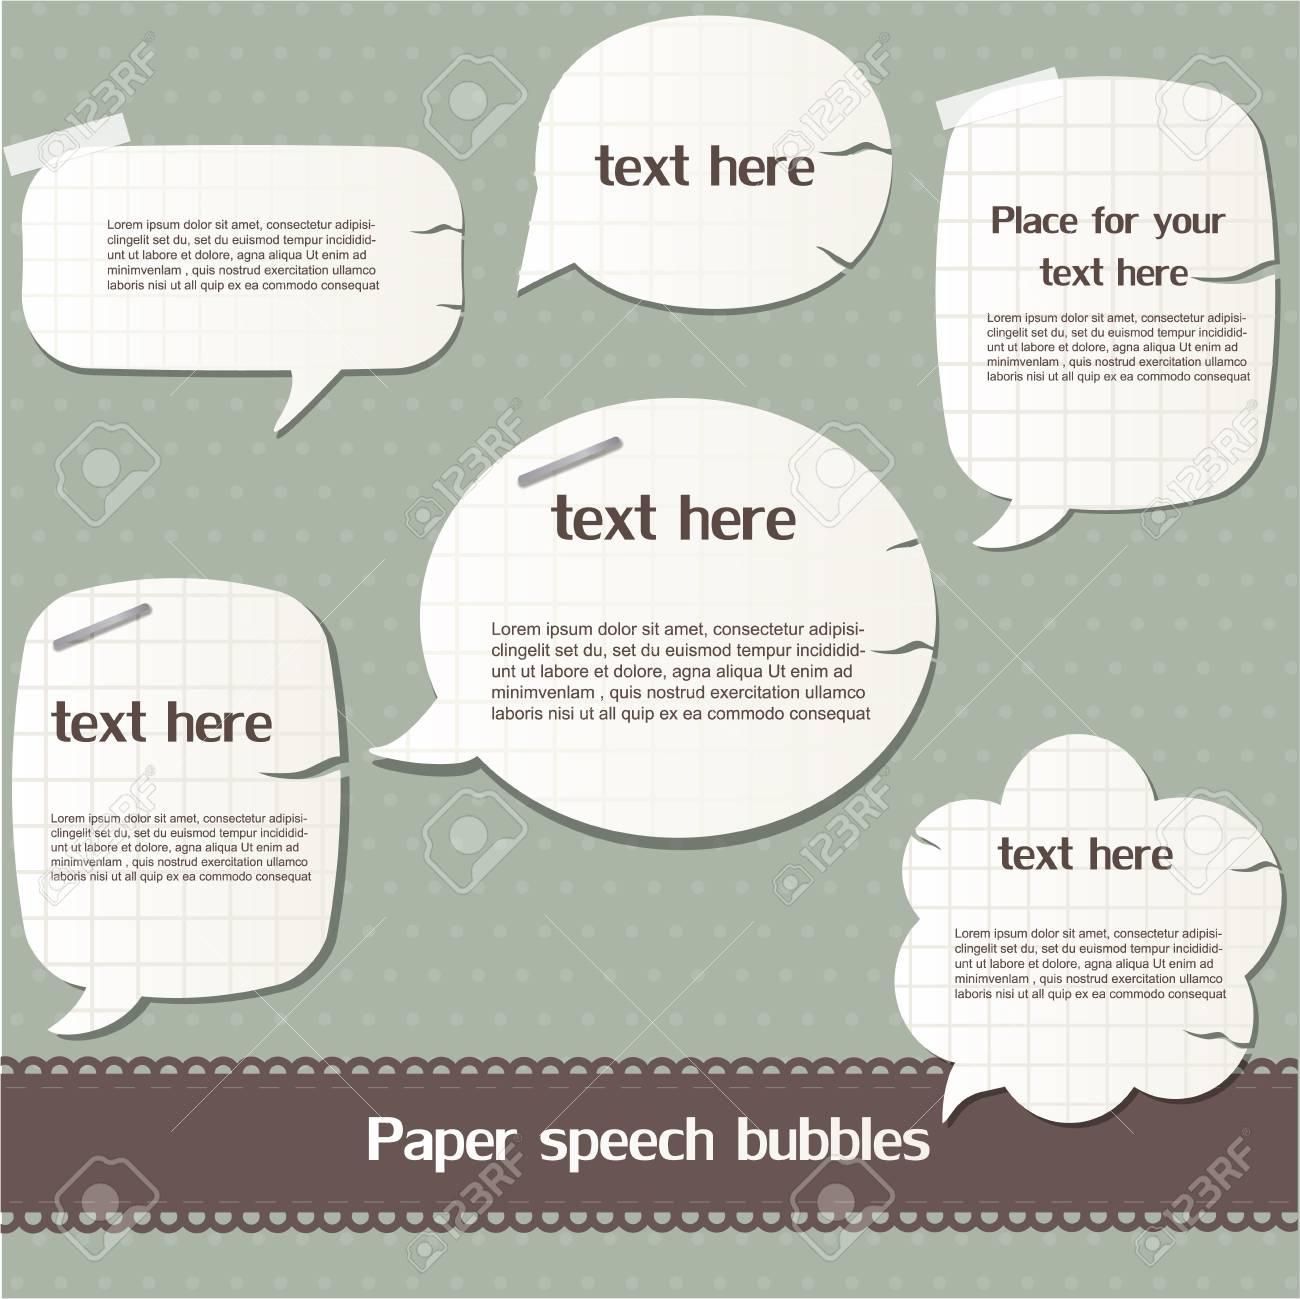 Paper speech bubbles Stock Vector - 12792537